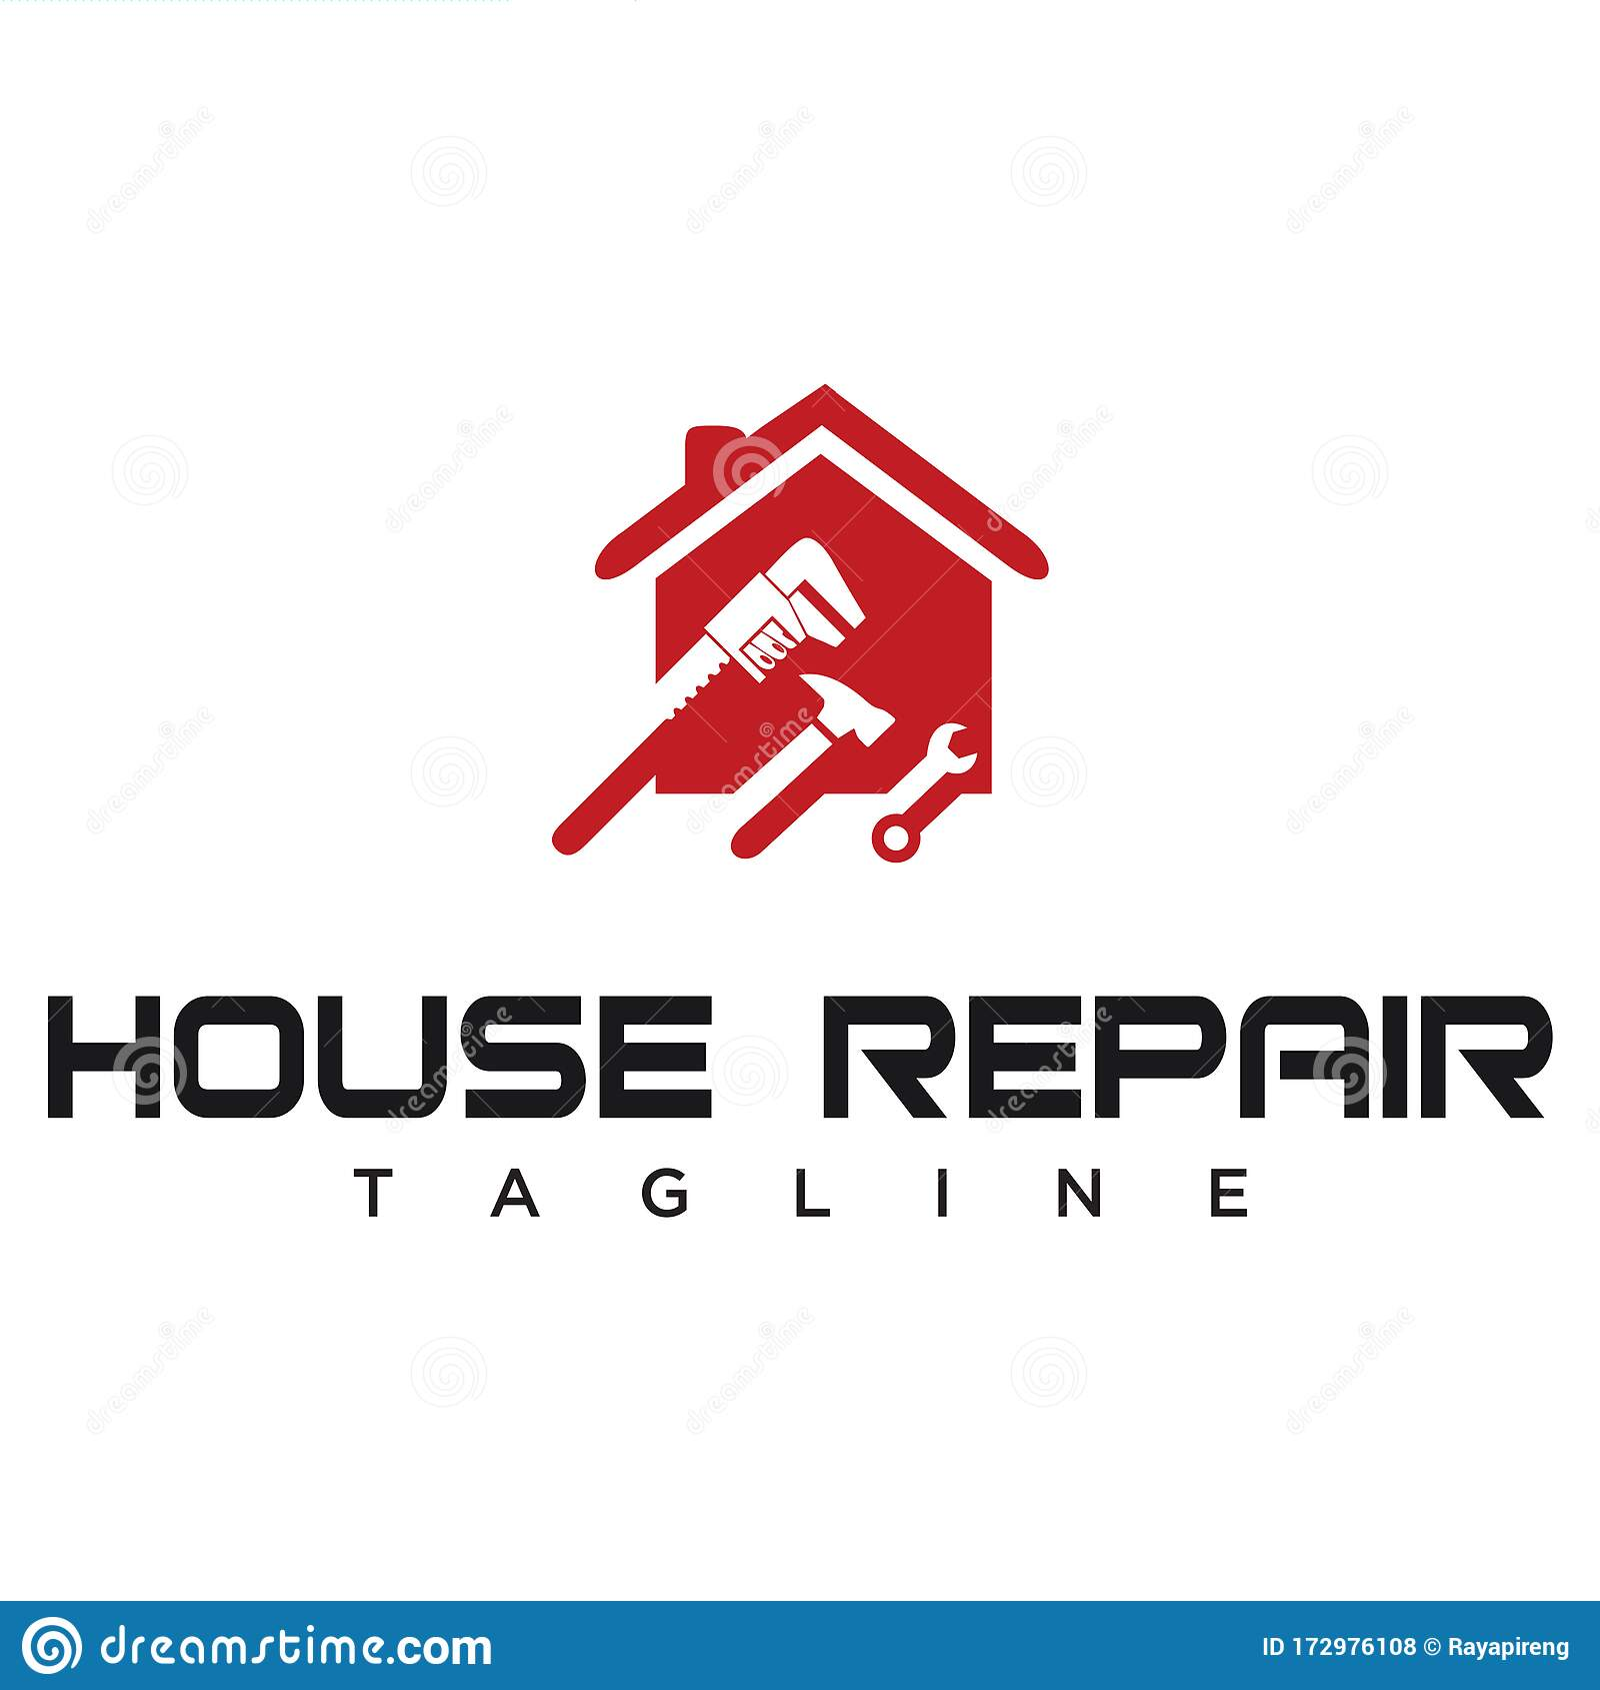 Home Repair Logo House Home Improvement Logo Design Creative House Renovation Service Logo Design Modern Real Estate Logo Com Stock Vector Illustration Of Home Design 172976108